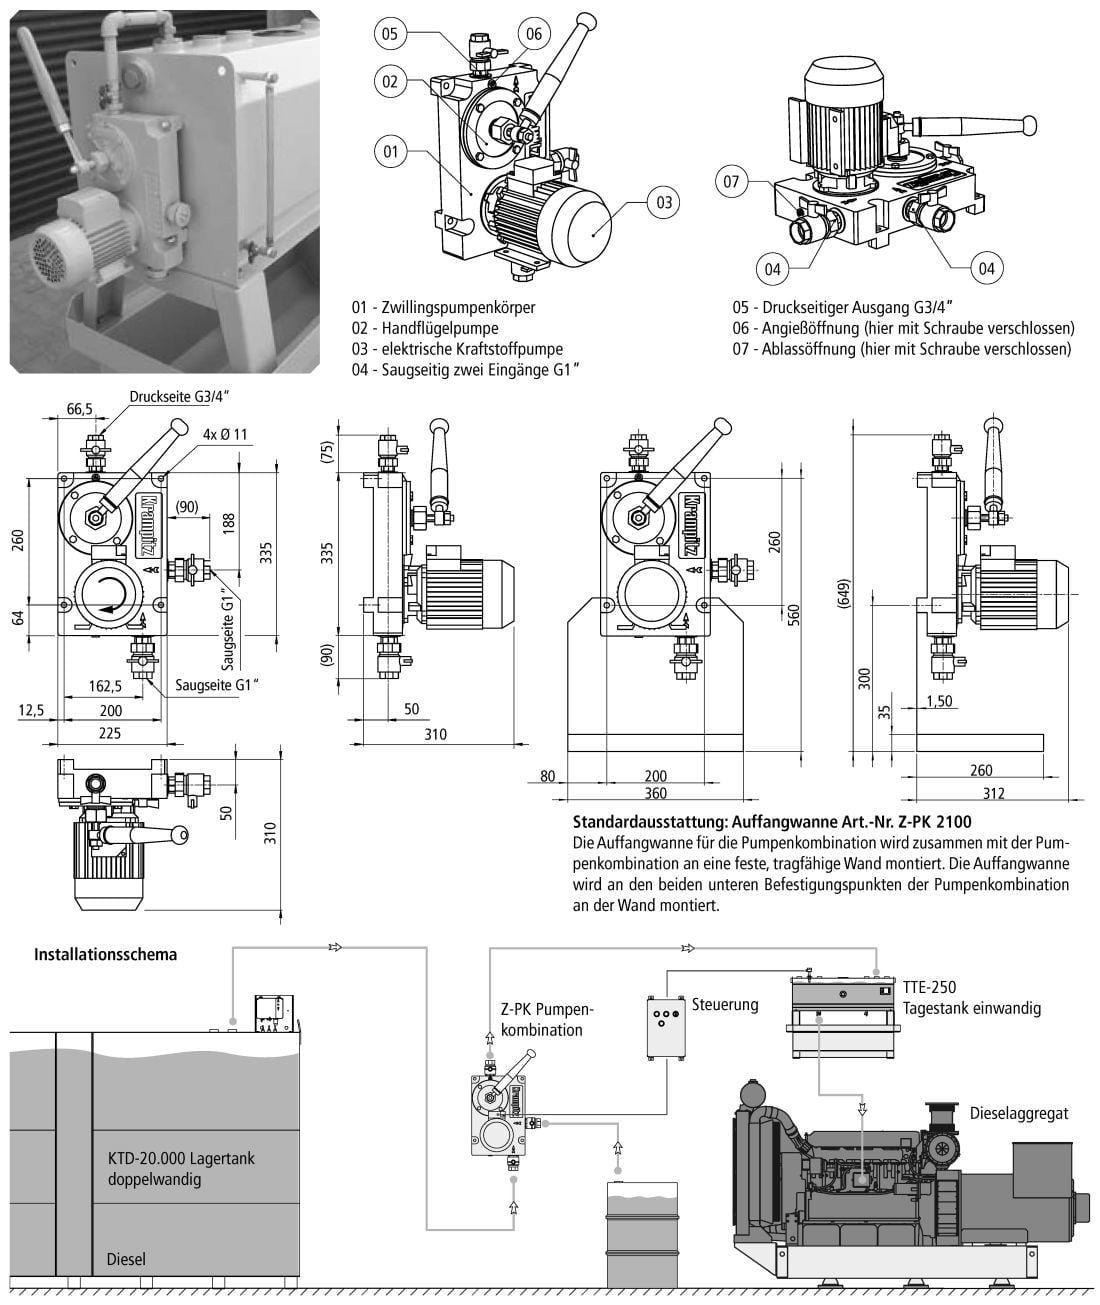 Pumpenkombination Z-PK